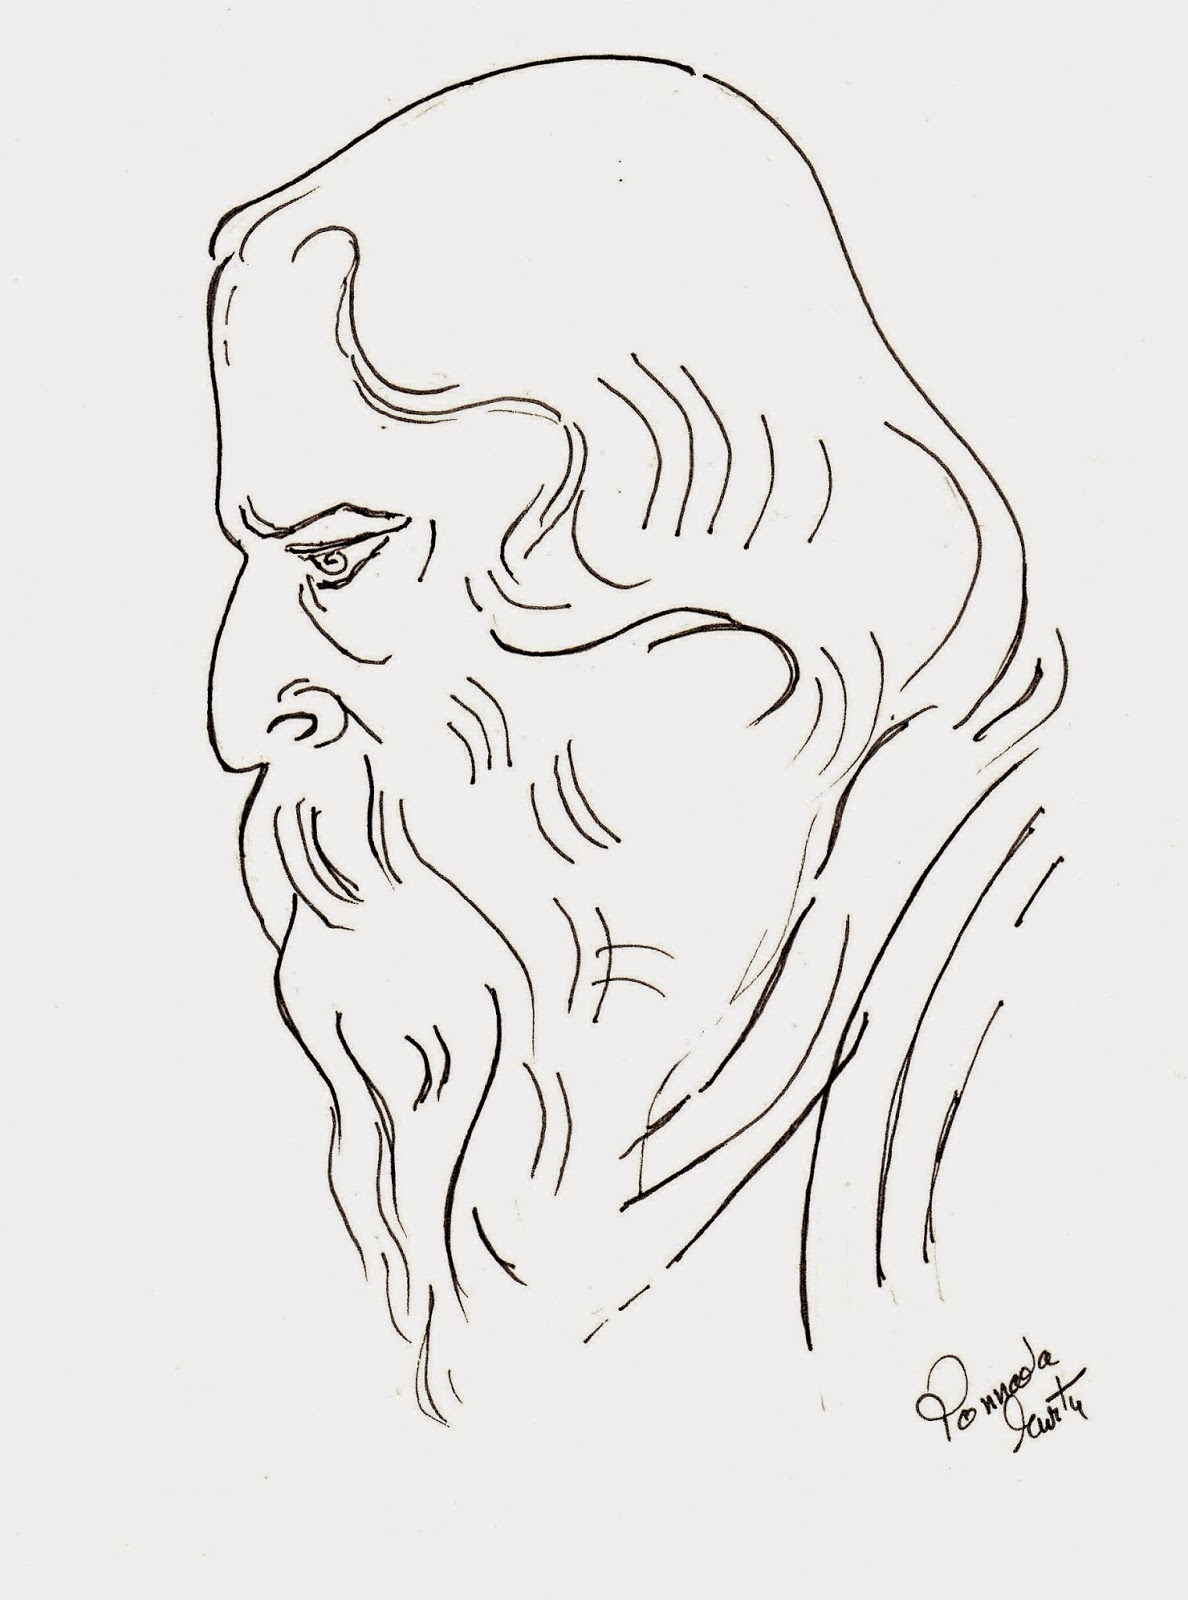 Sketches and Drawings : Rabindranath Tagore - line art